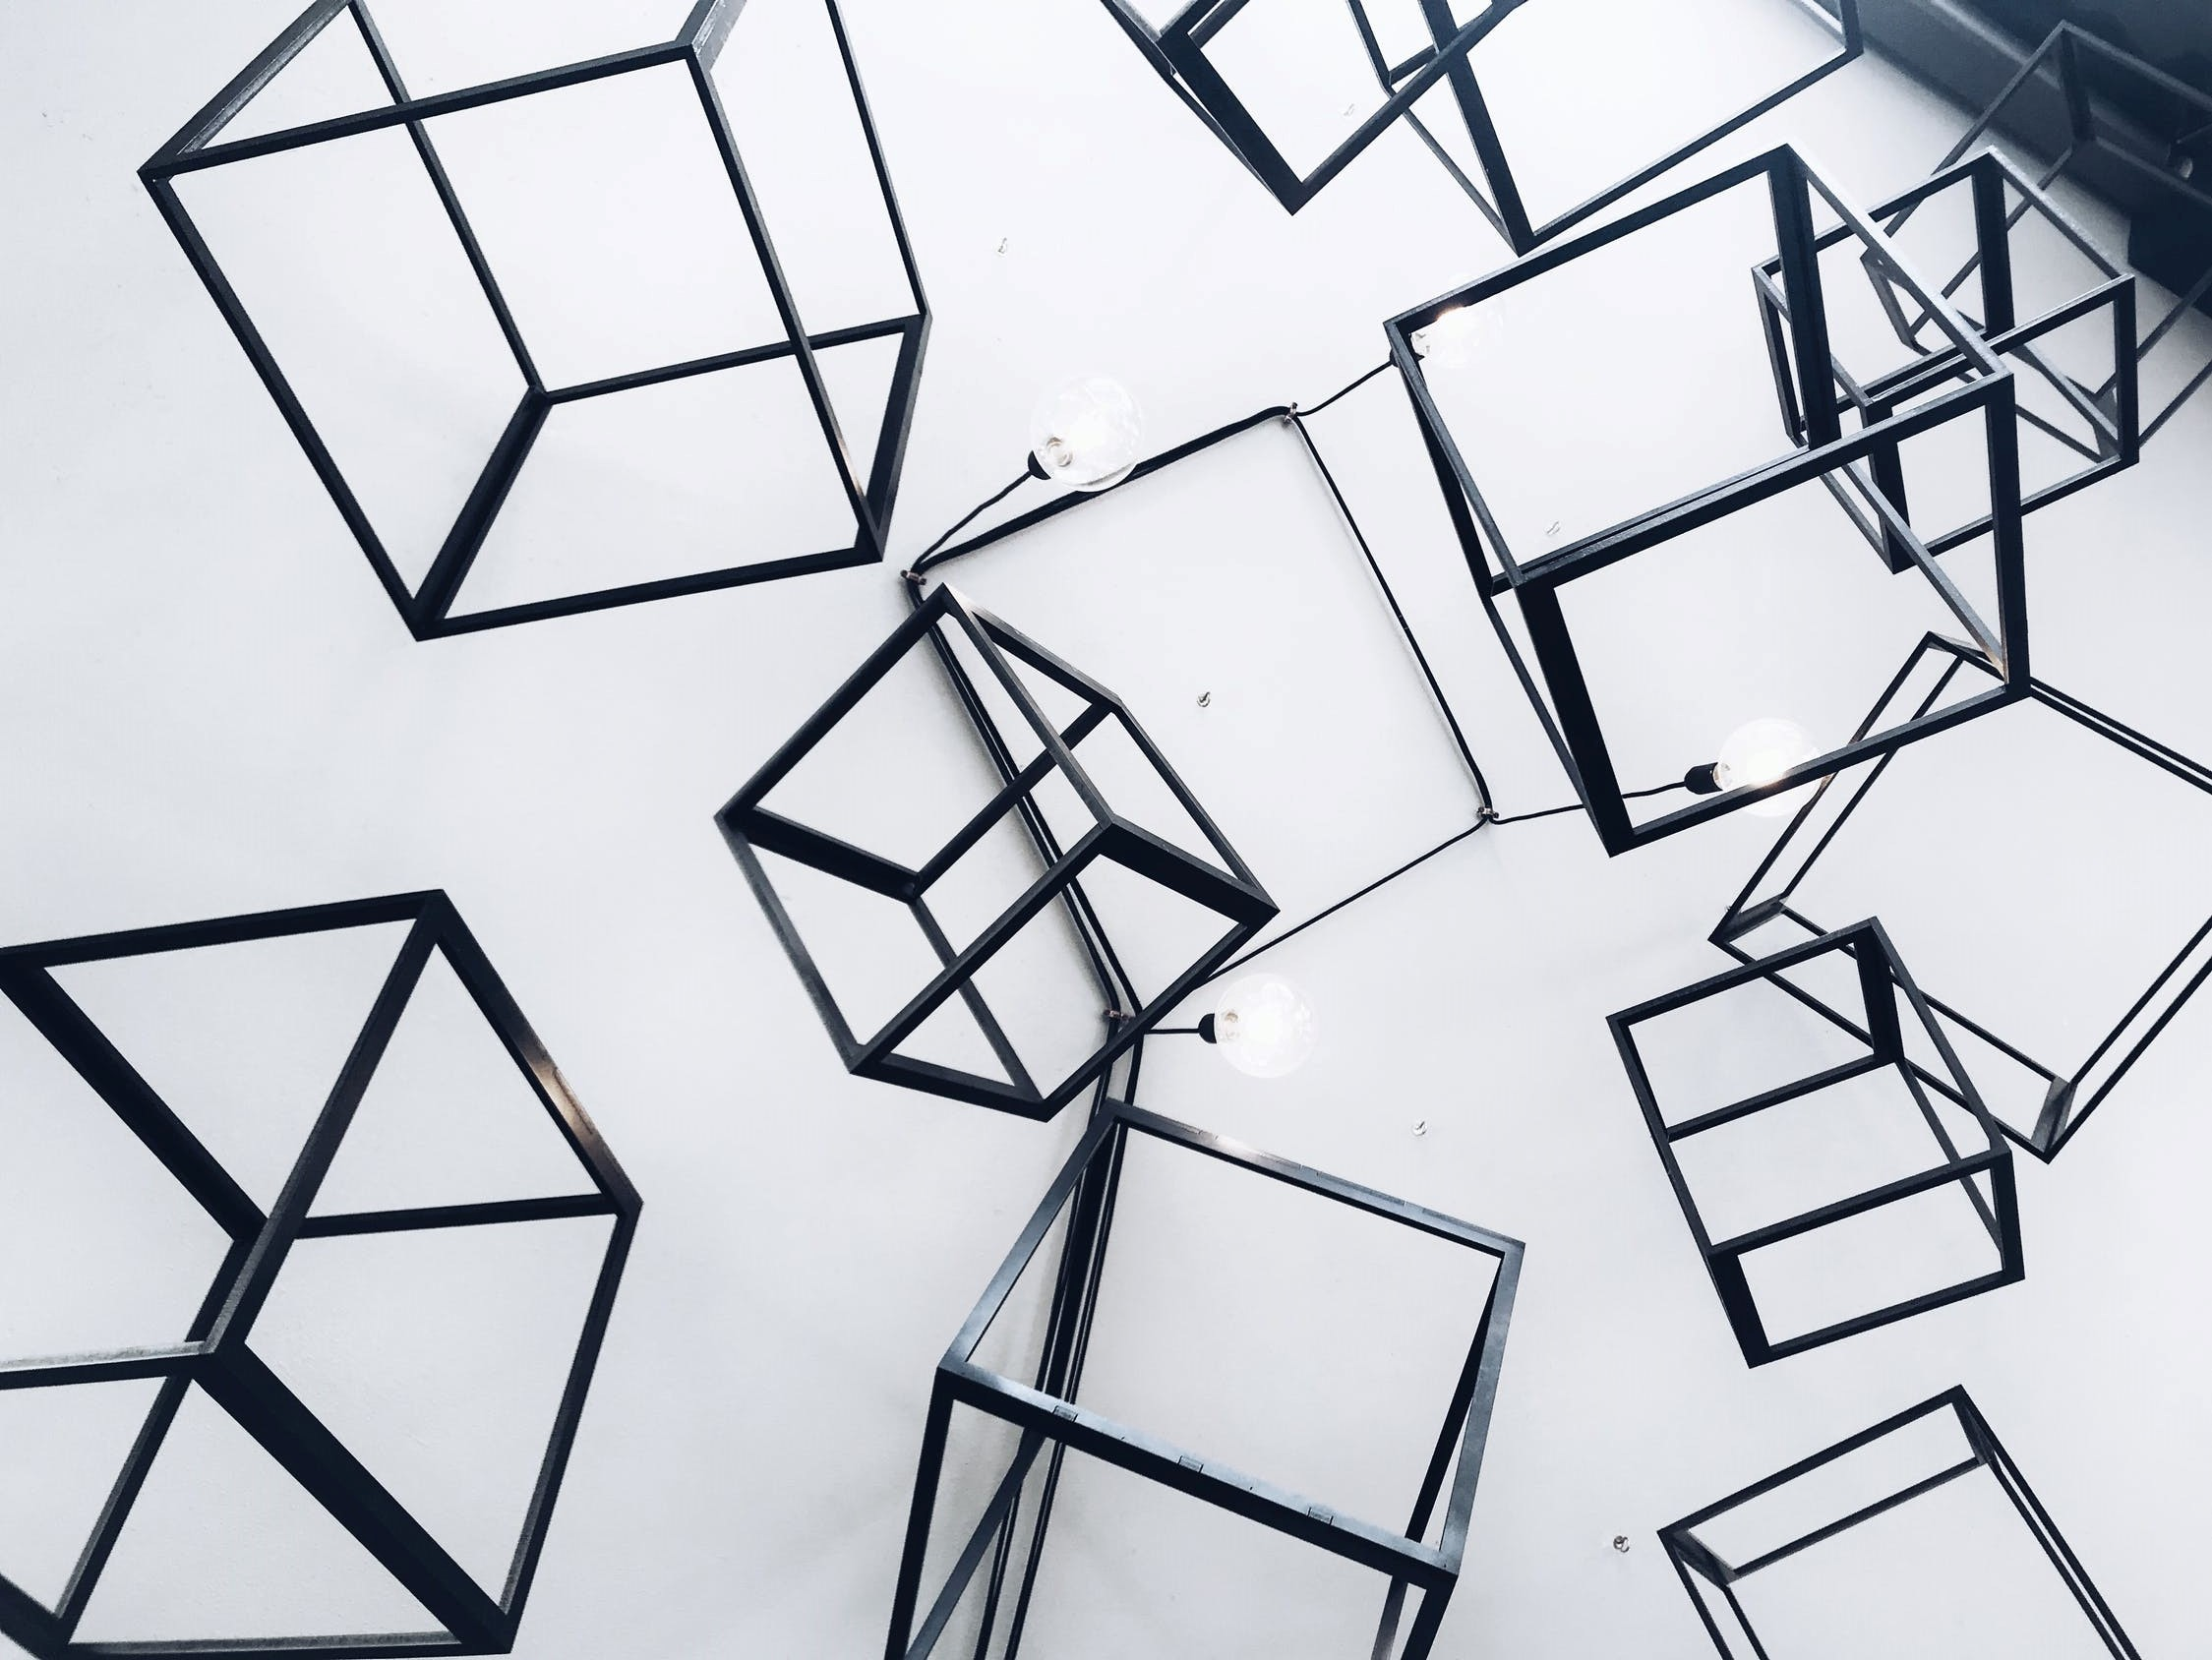 1. Design Pattern